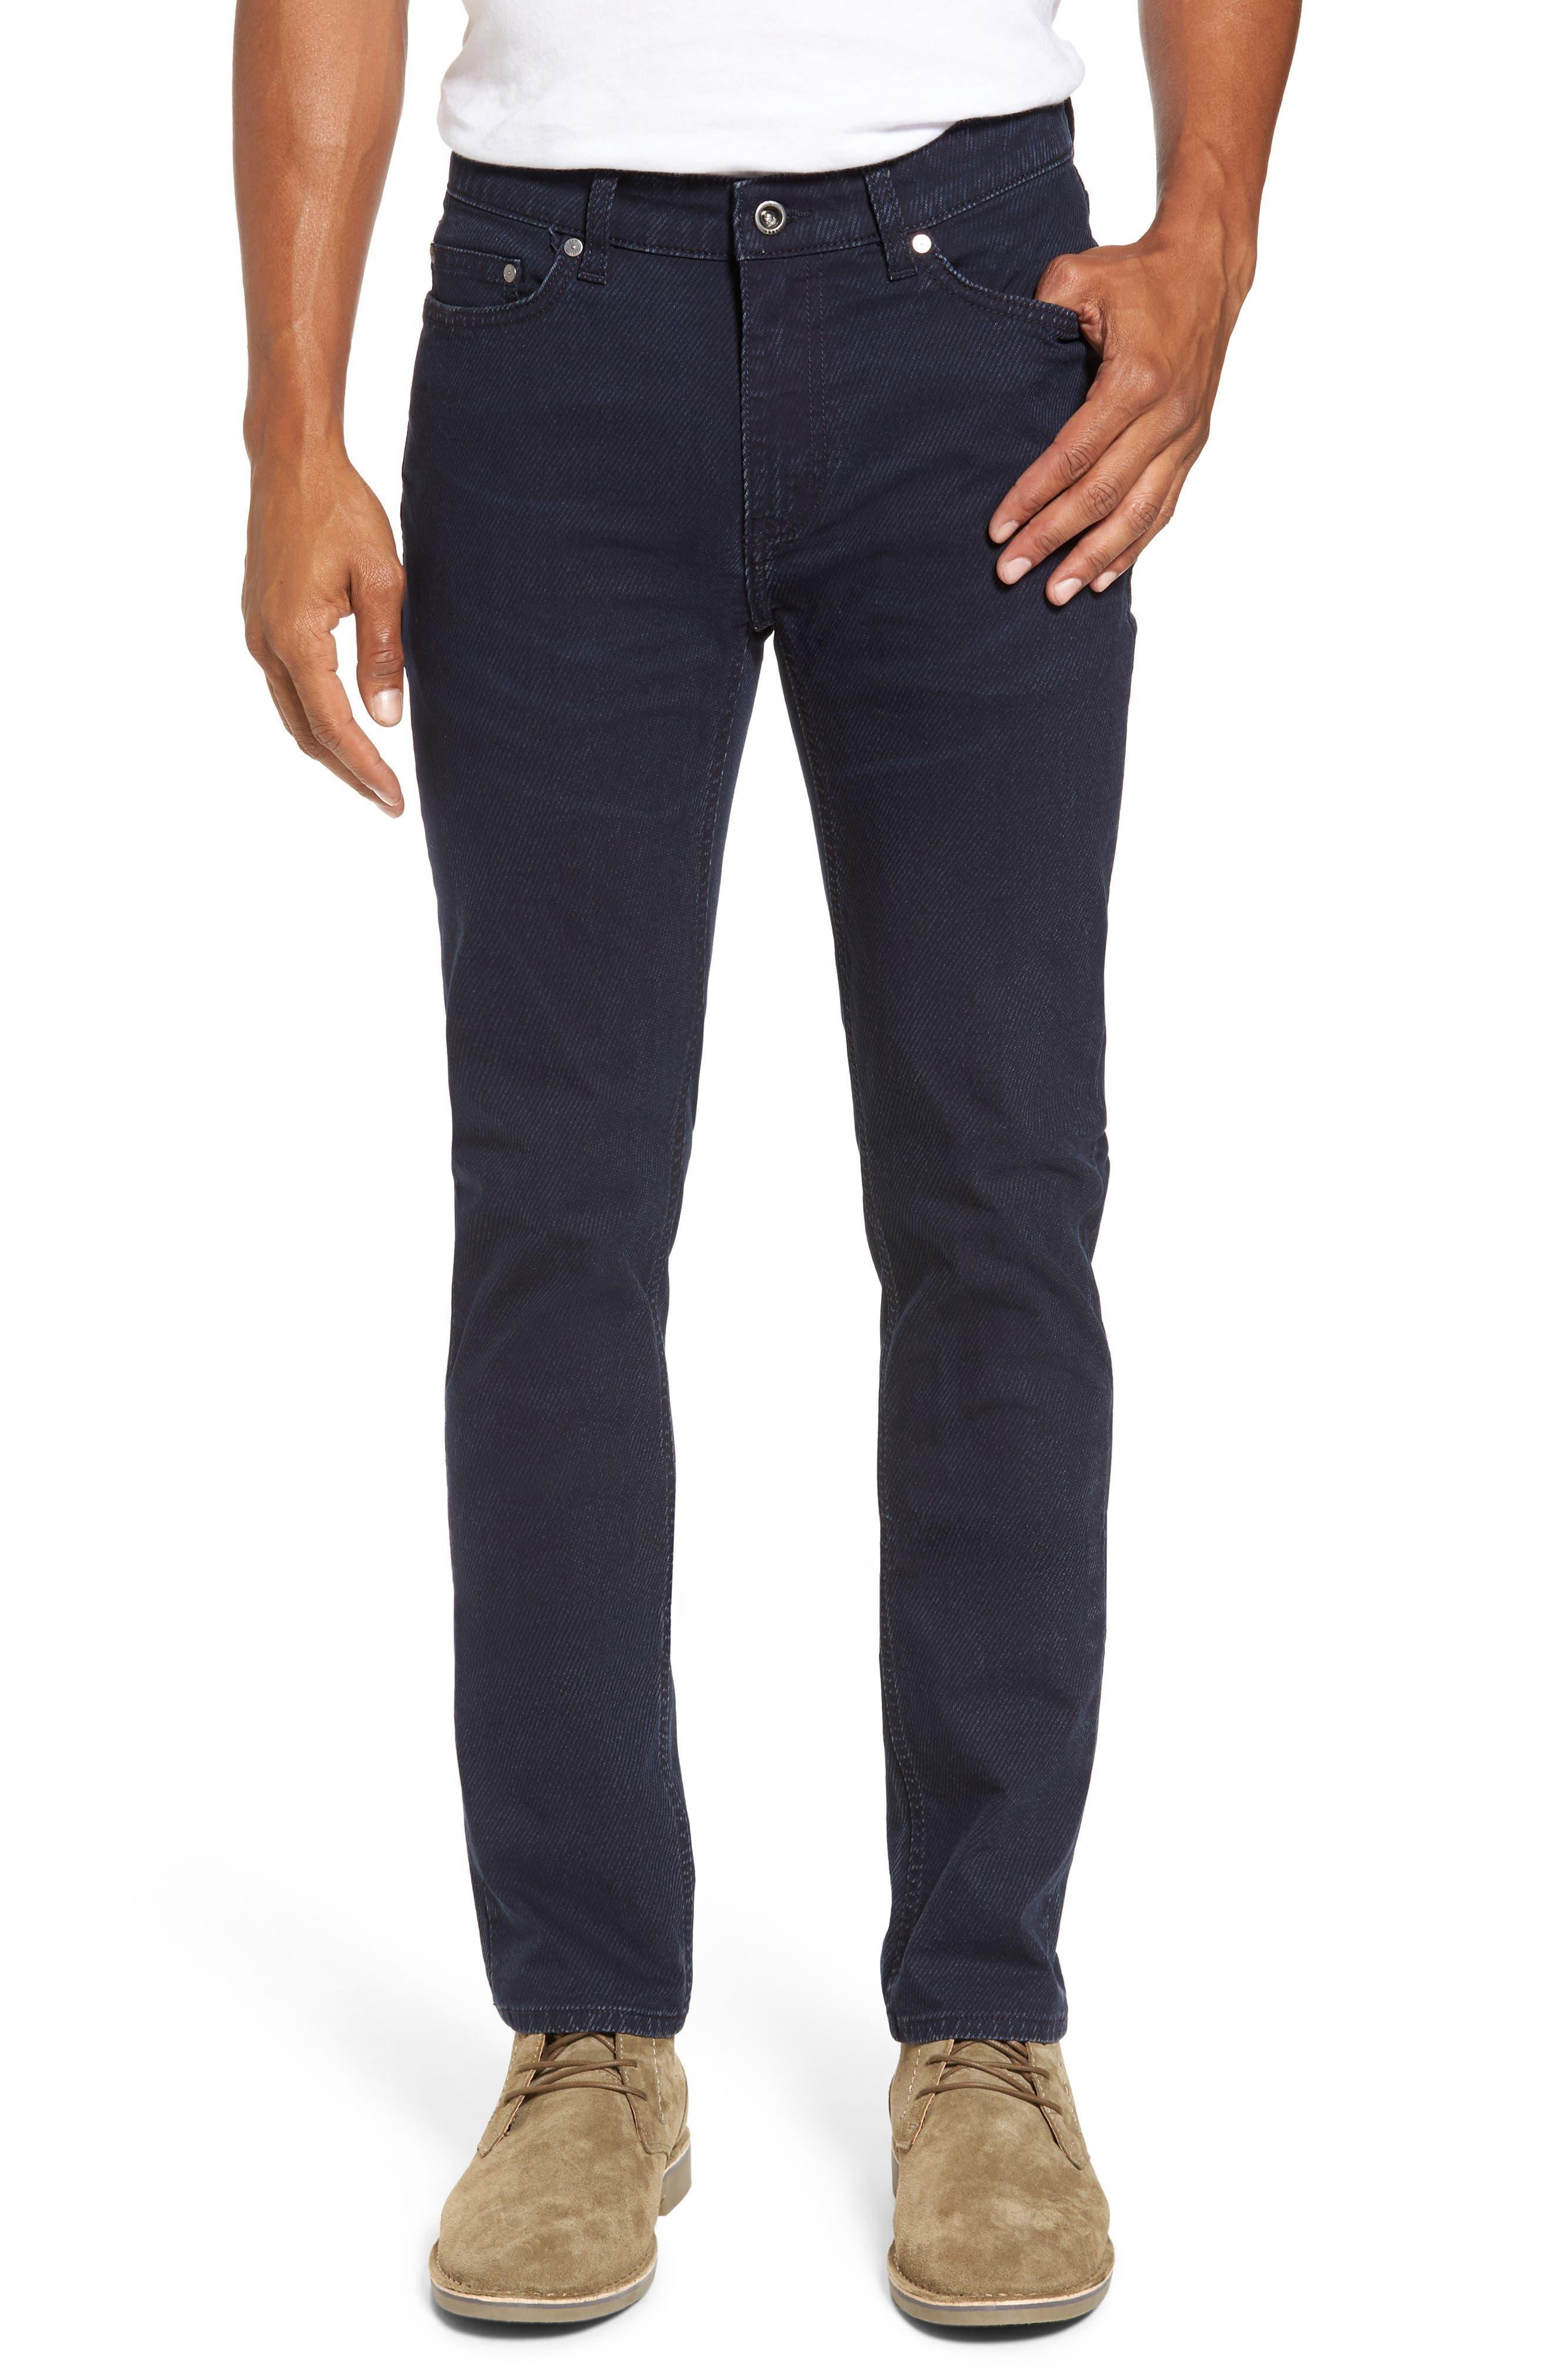 Palmwood Slim Fit Jeans,                         Main,                         color, Indigo